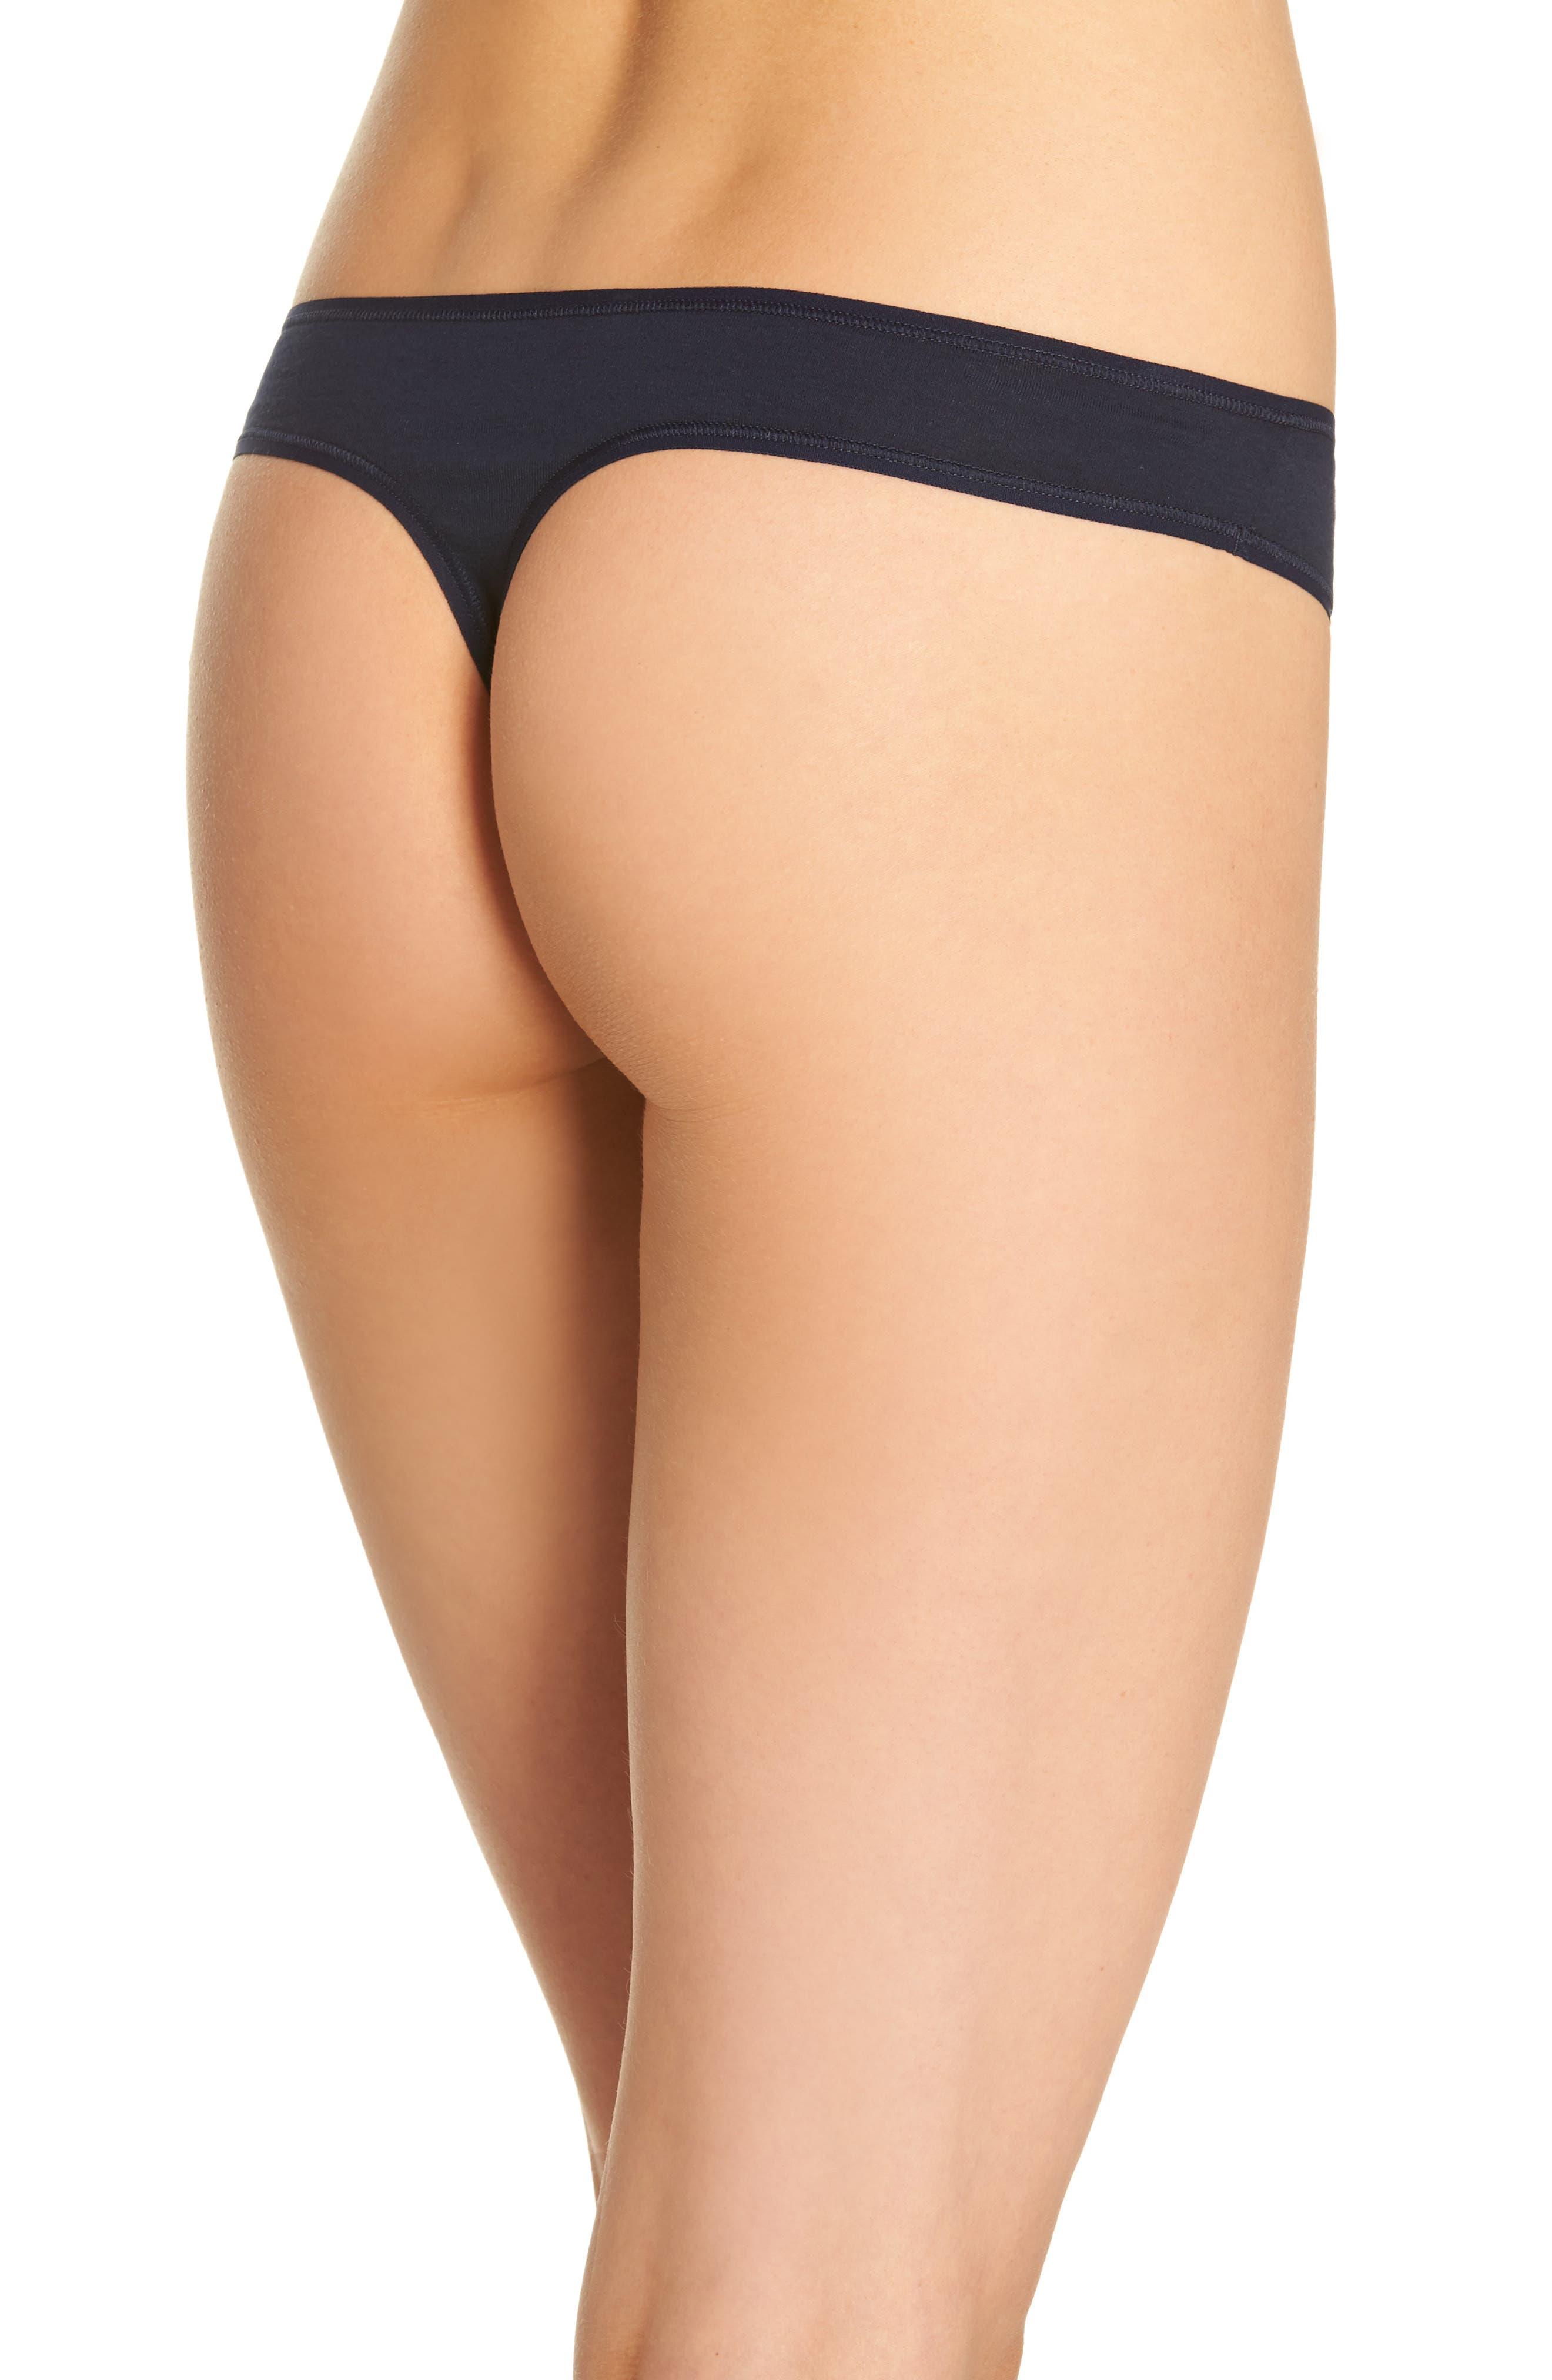 Alternate Image 2  - Calvin Klein Form Thong (3 for $33)